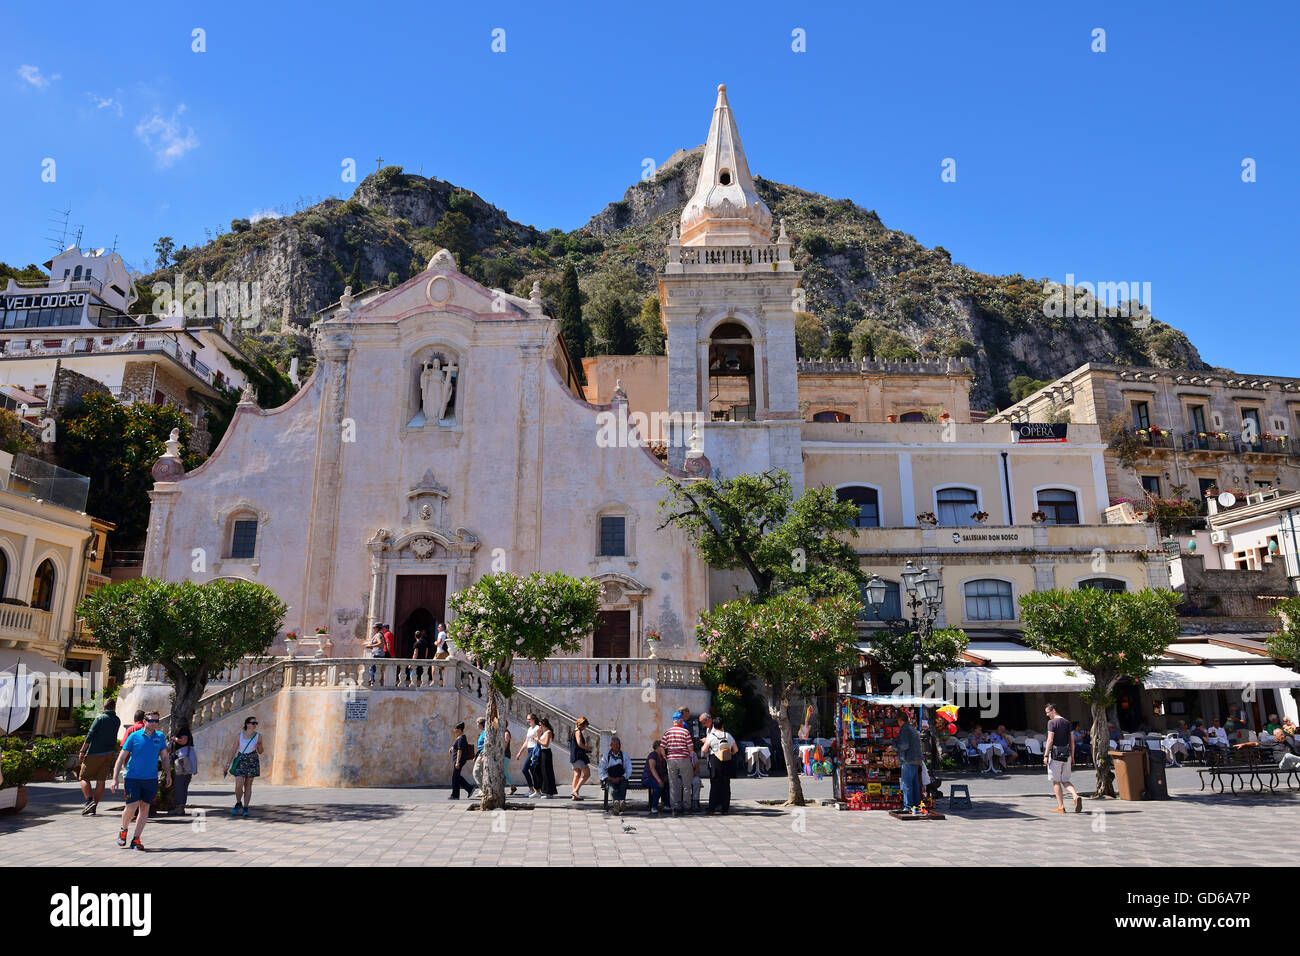 Church of San Giuseppe in Piazza IX Aprile - Taormina, Sicily, Italy - Stock Image